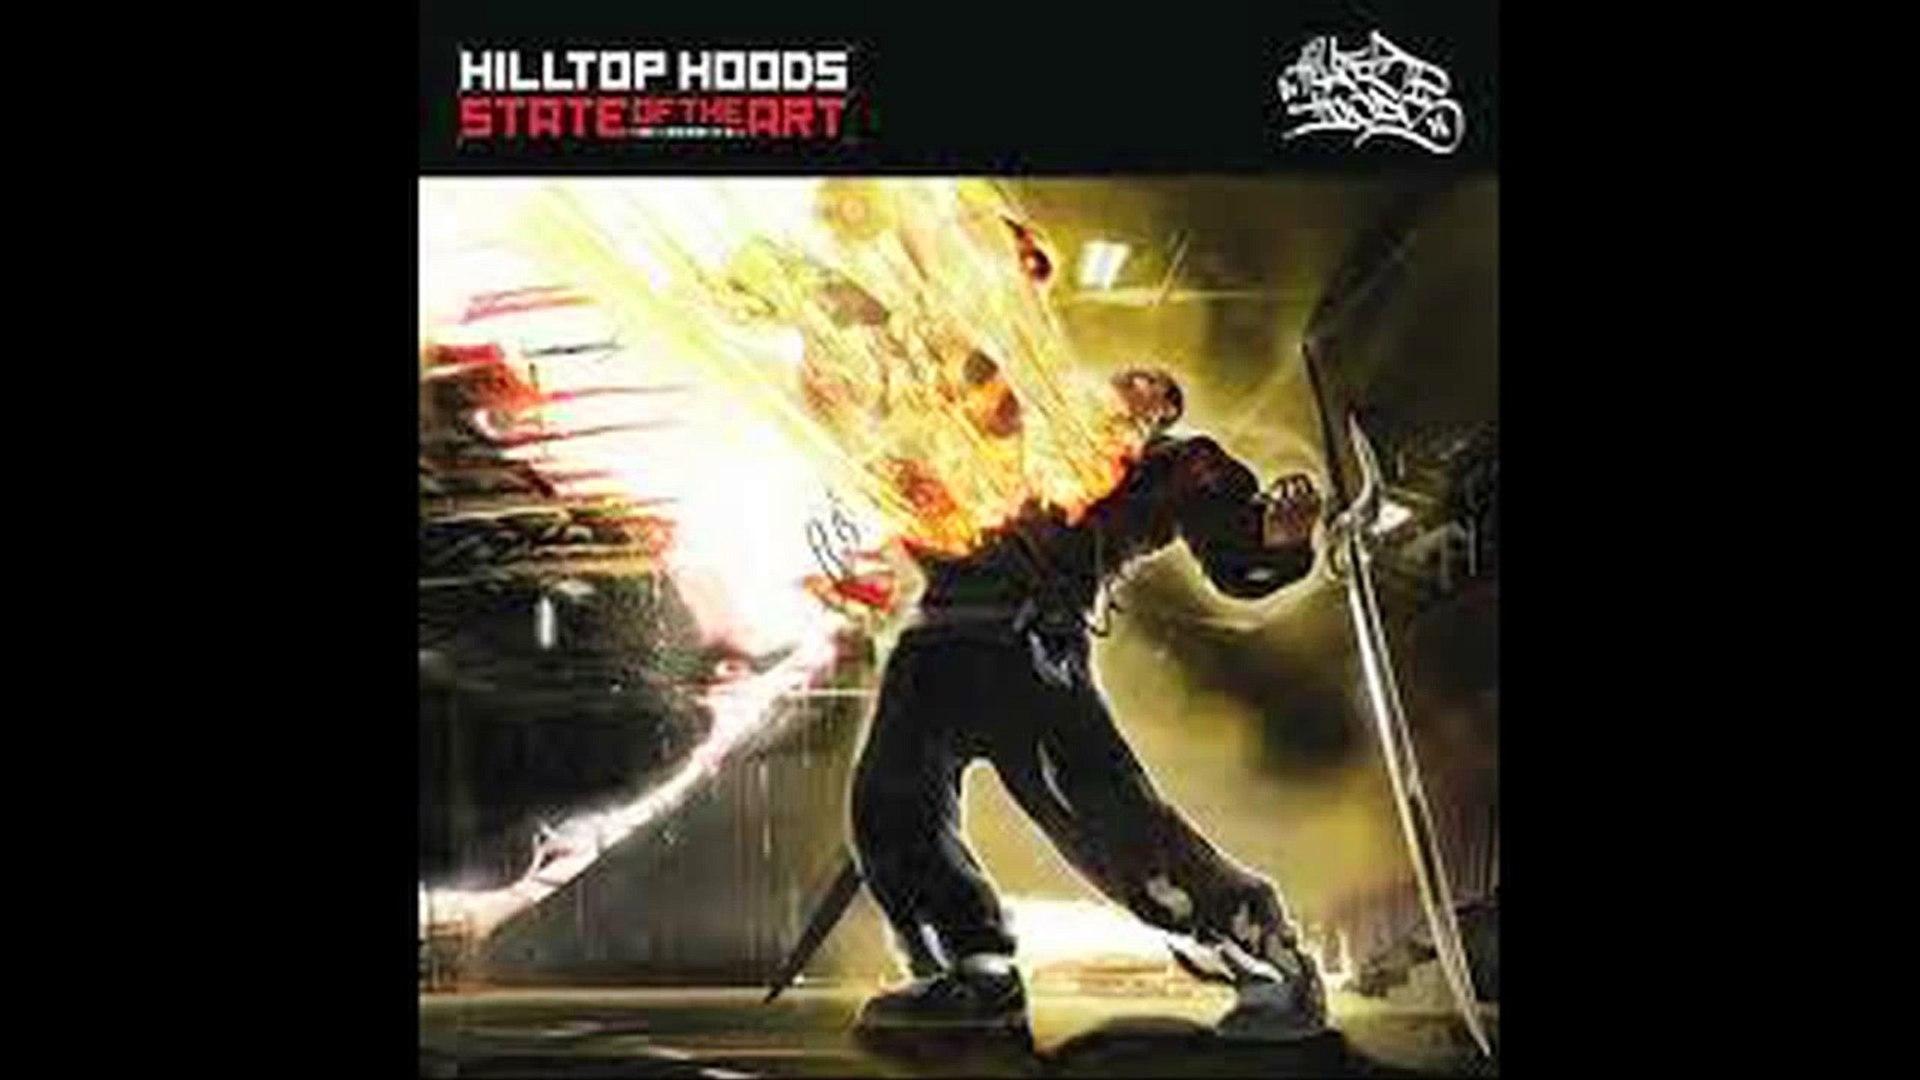 Hilltop Hoods Chase That Feeling